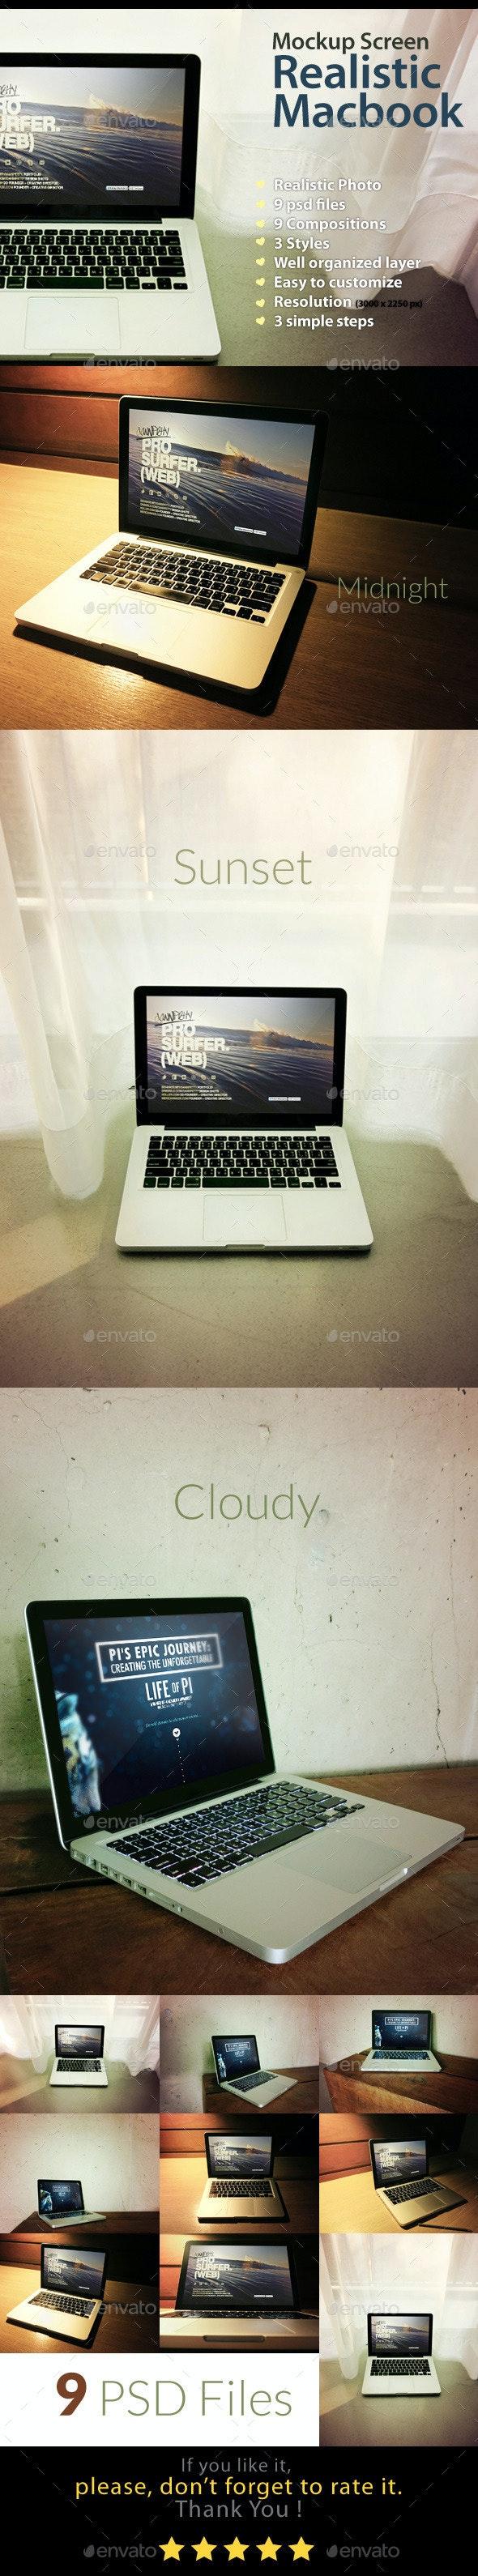 Realistic Macbook Mockup - Laptop Displays